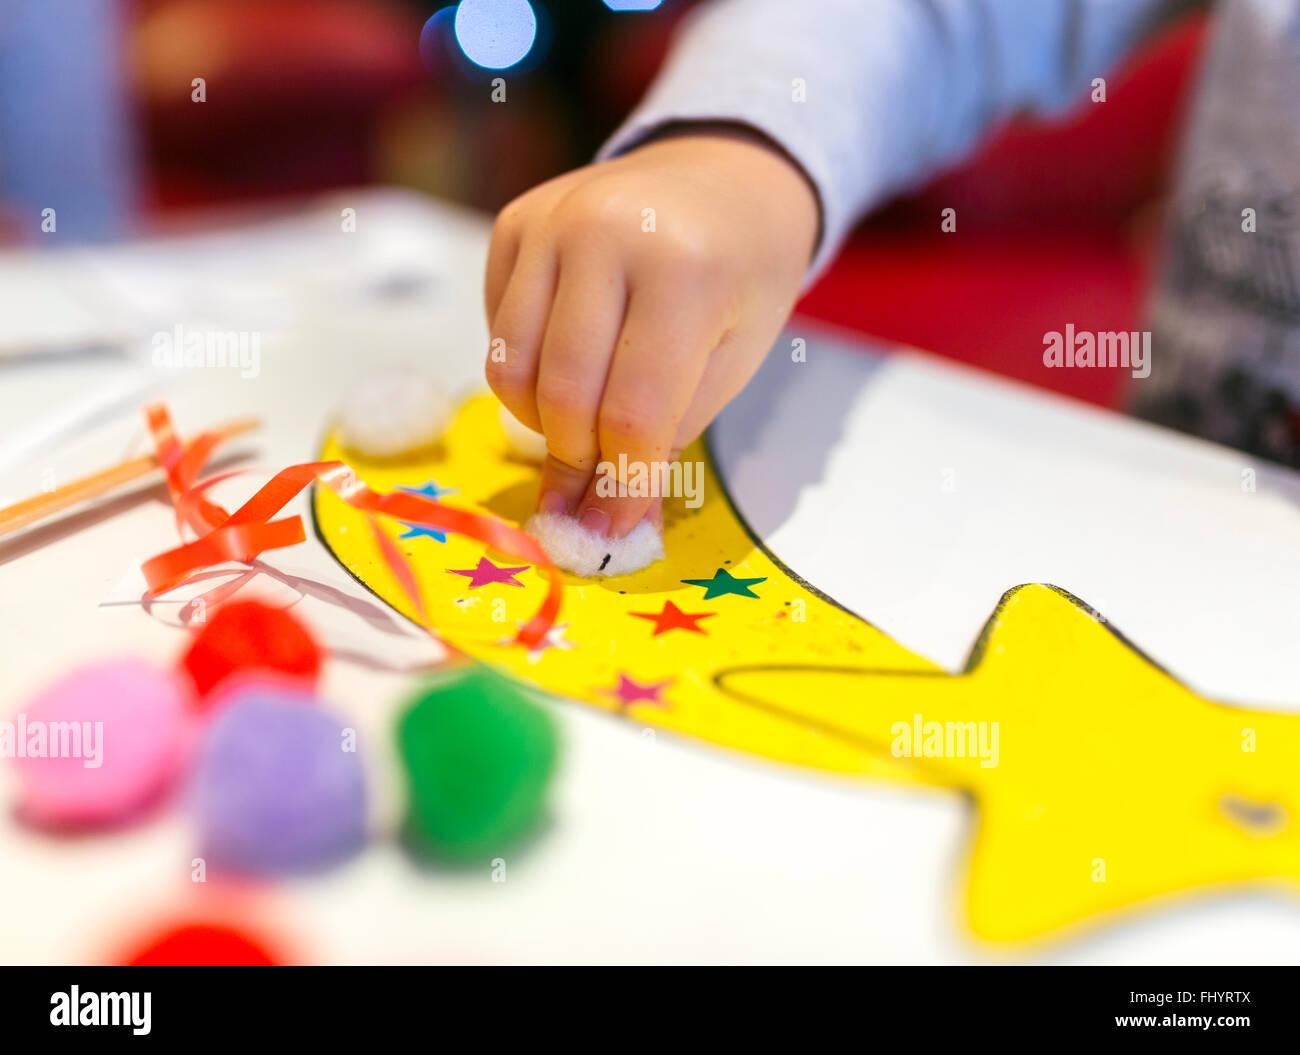 Mano de niña jugando decoración navideña, close-up Imagen De Stock